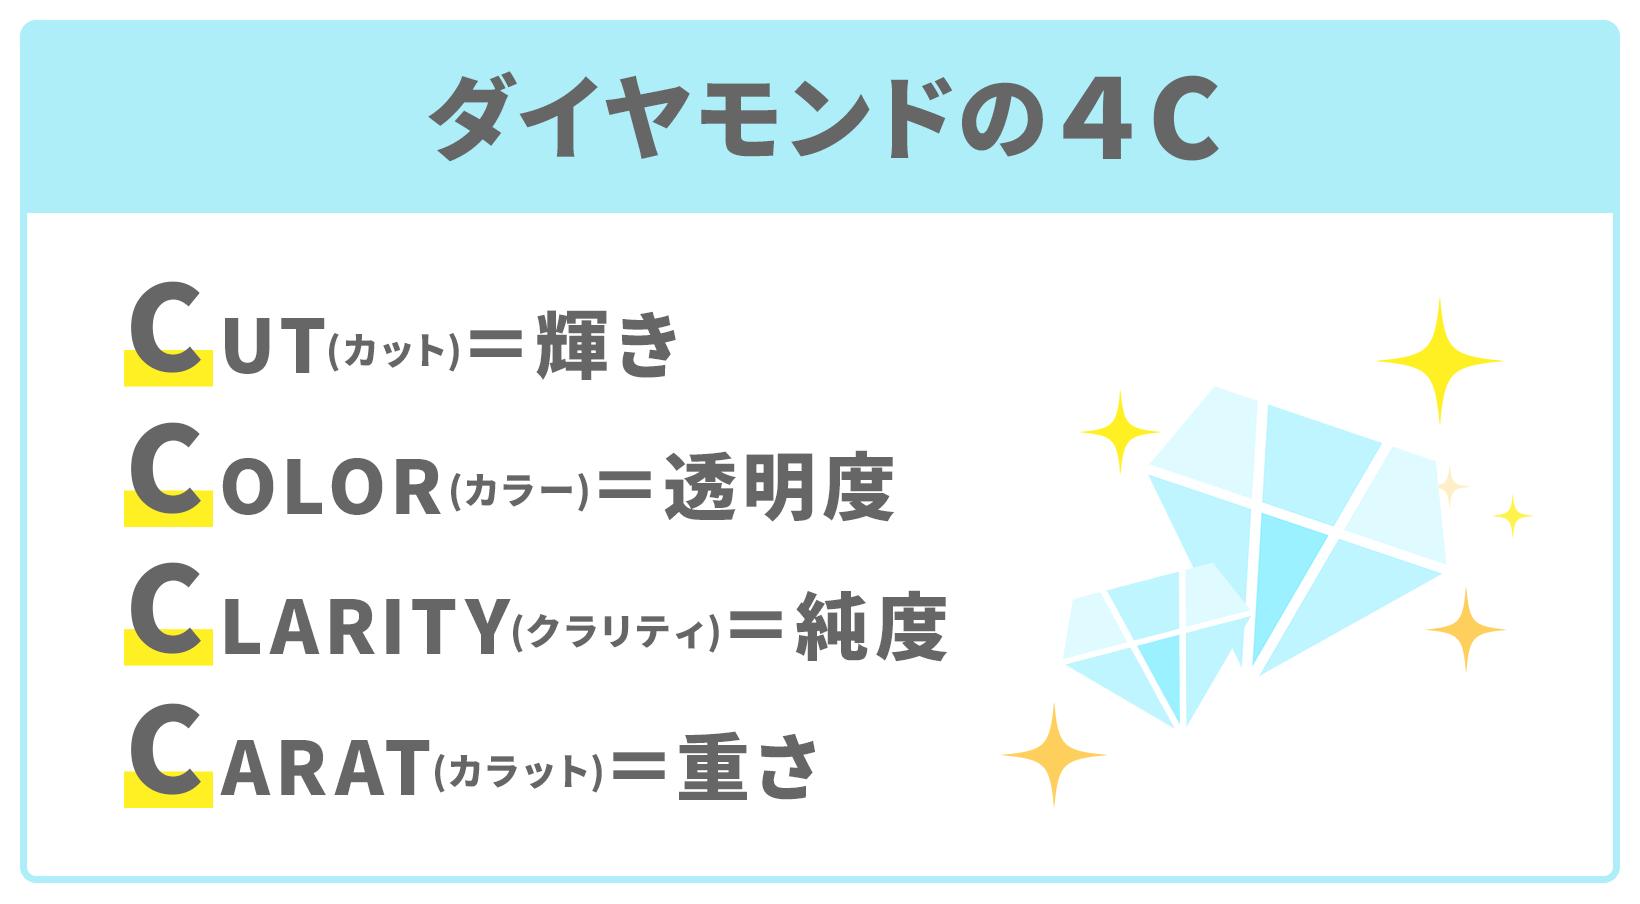 4Cとはcut(輝き)、color(透明度)、clarity(透明度)、carat(重さ)